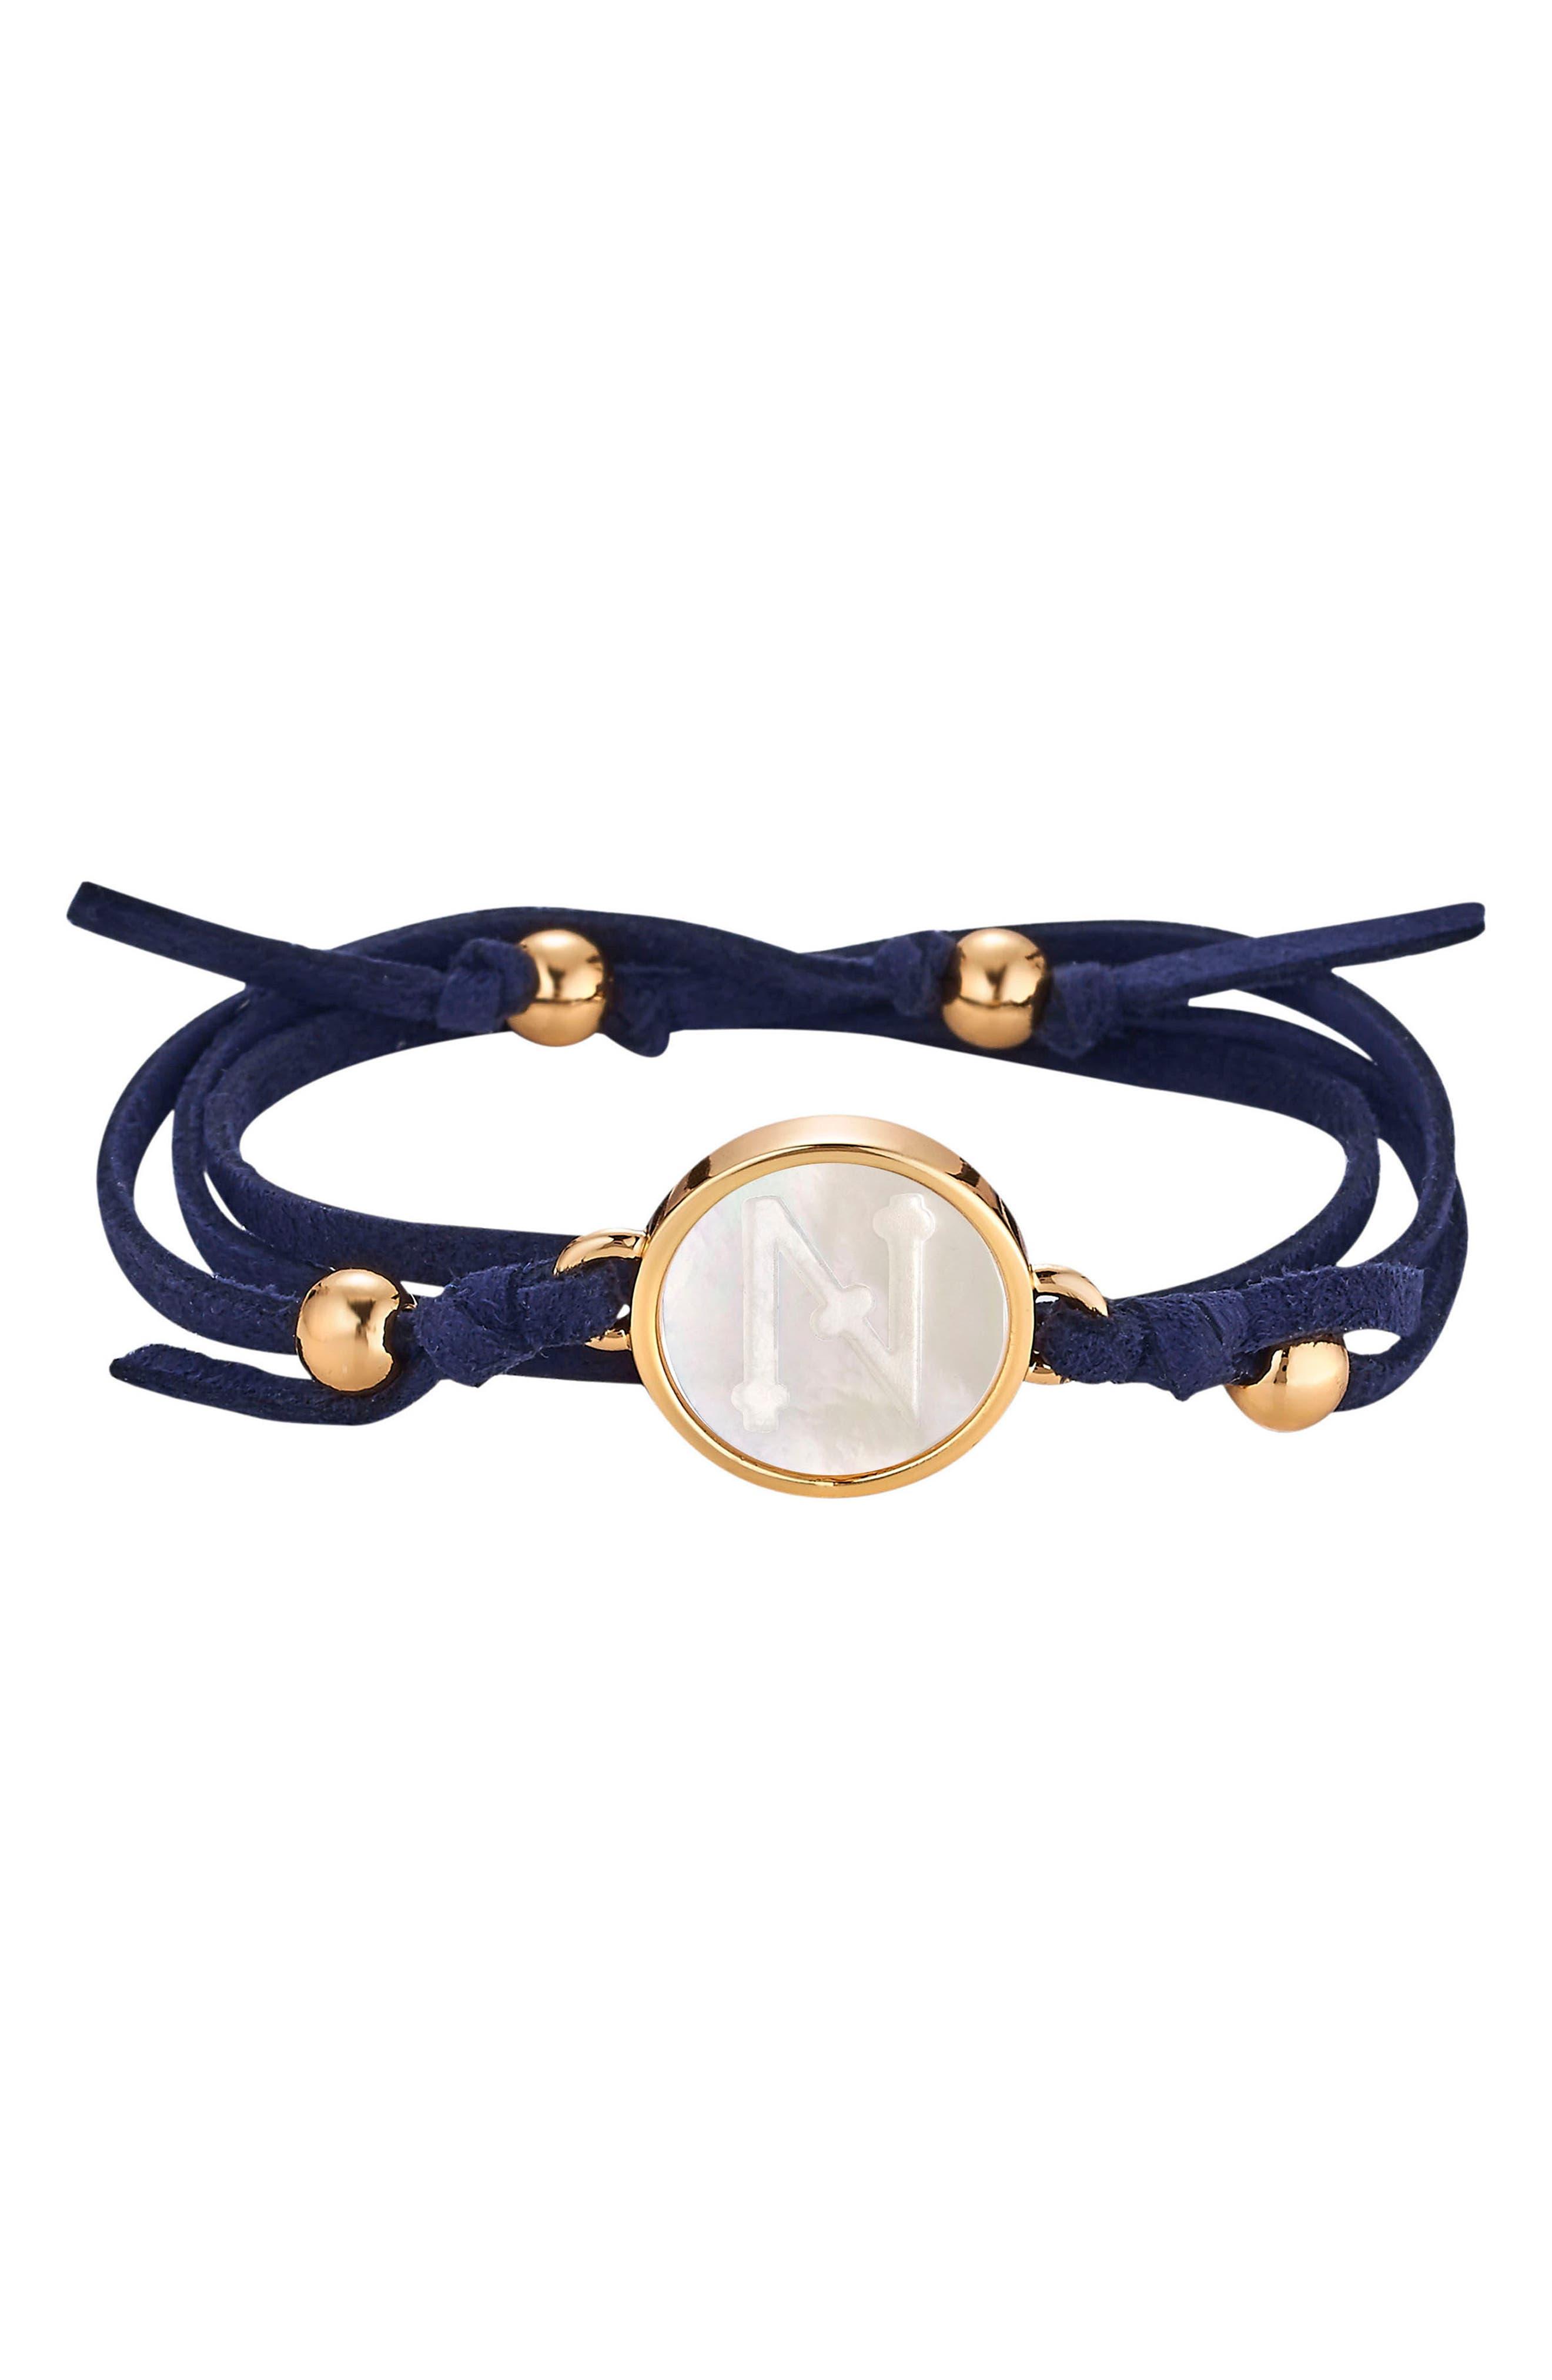 Main Image - ASHA Initial Suede Wrap Bracelet